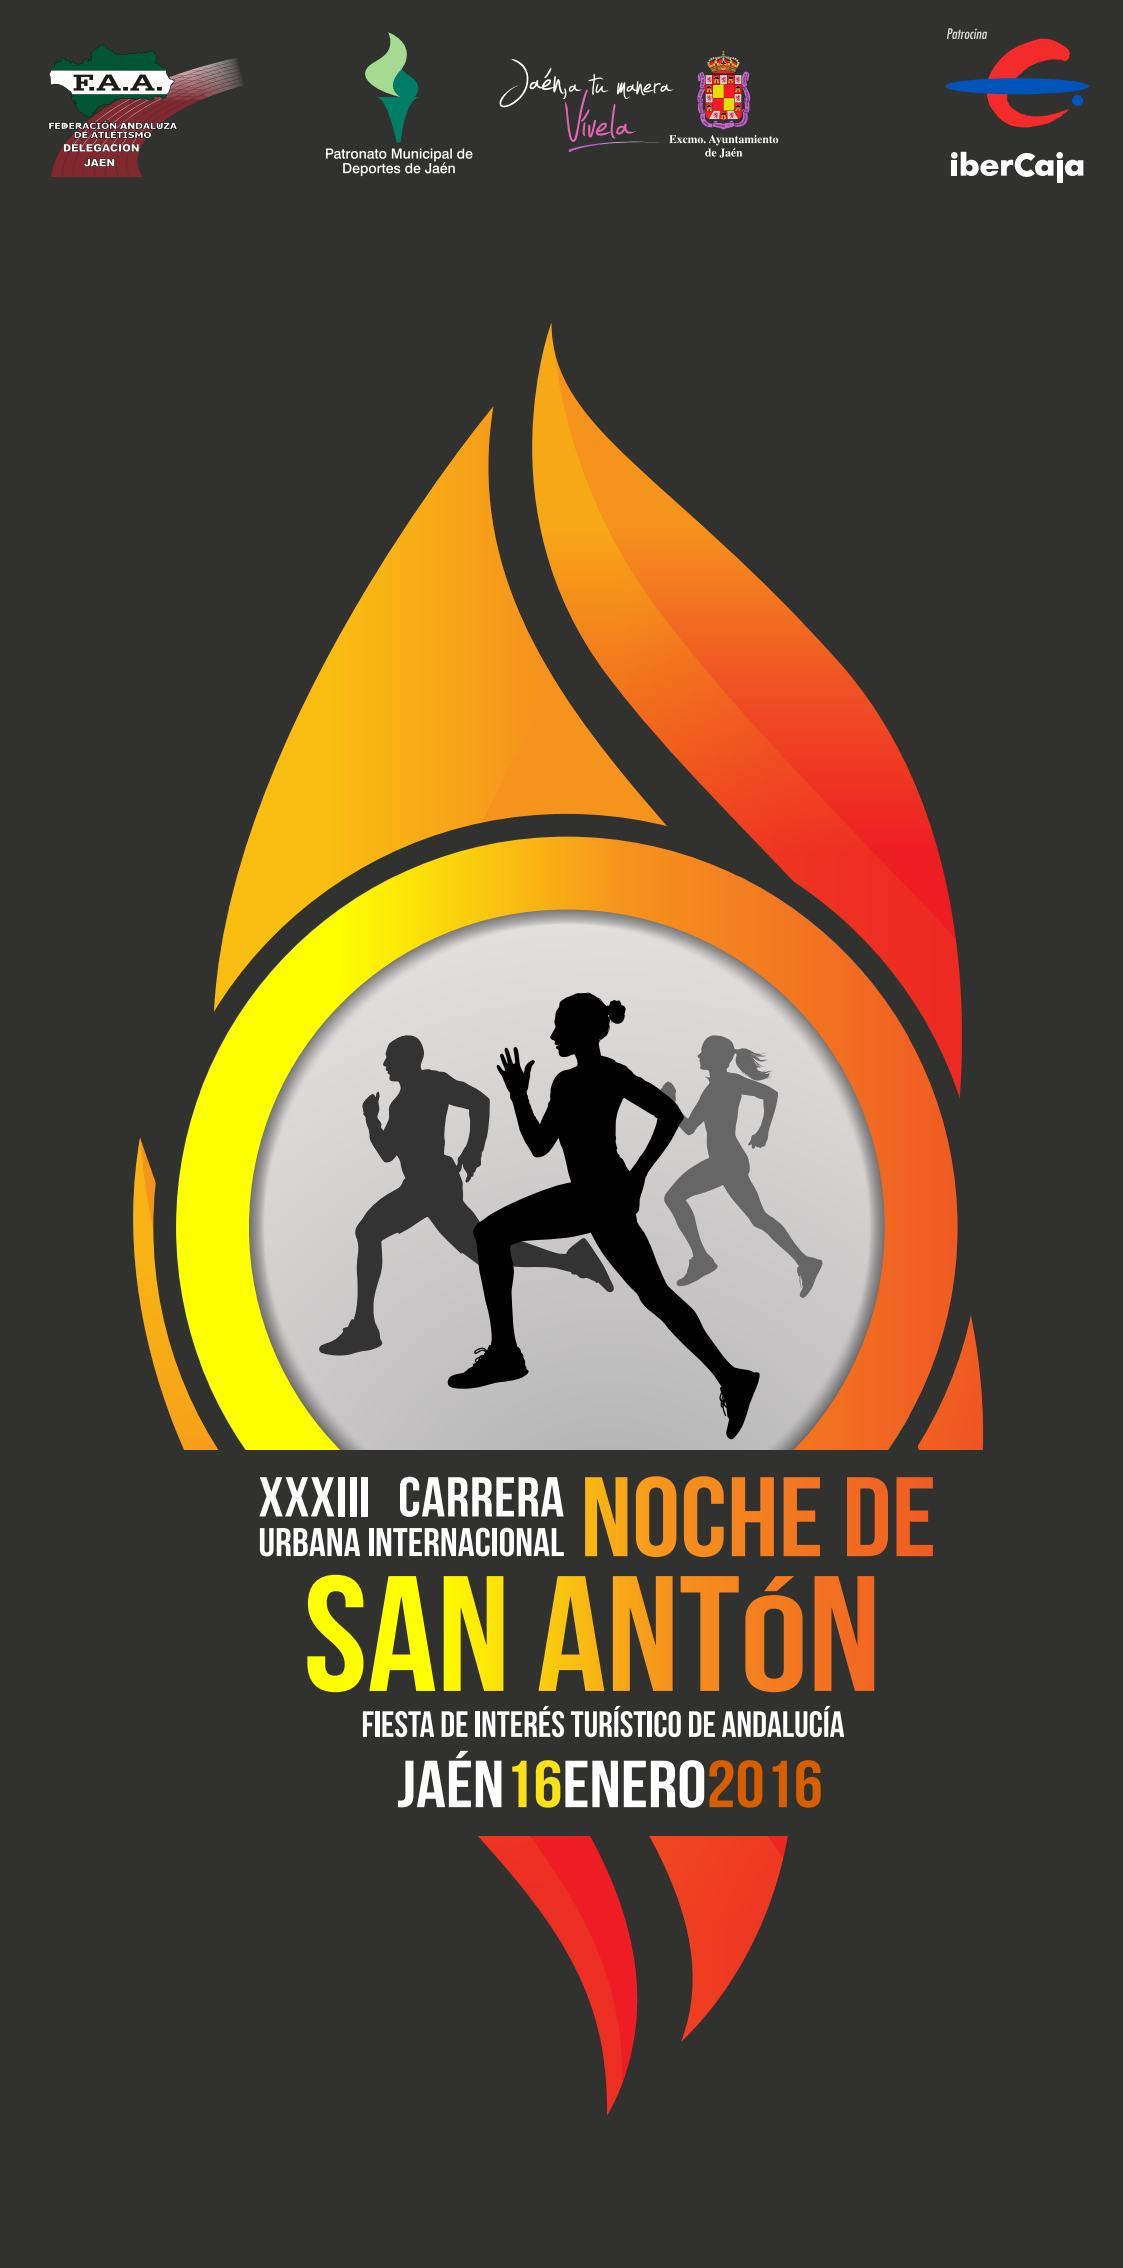 XXXIII Carrera Urbana Noche de San Antón